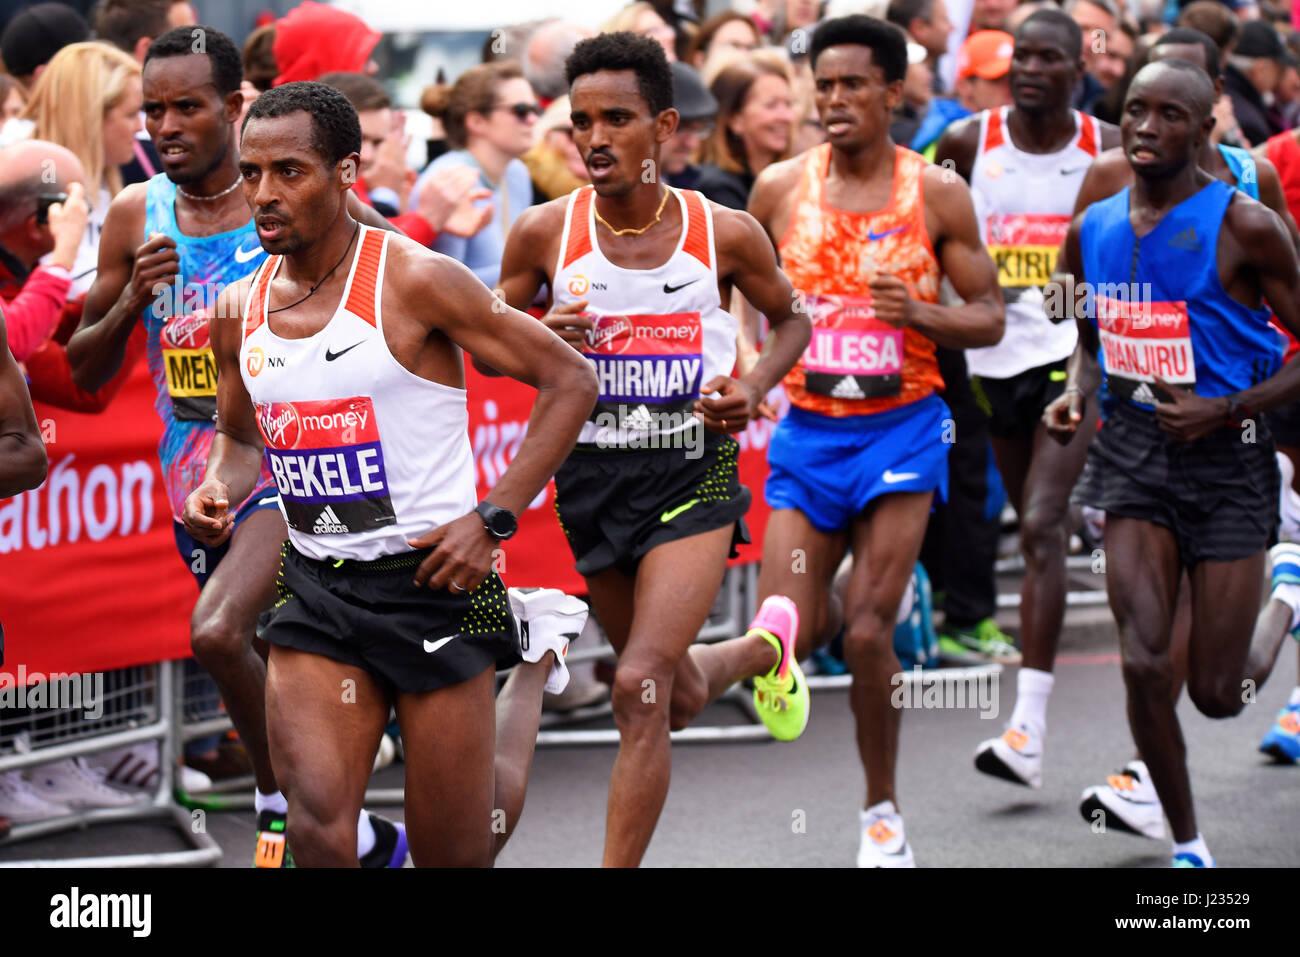 winner-daniel-wanjiru-and-the-lead-pack-at-the-2017-virgin-london-J23529.jpg